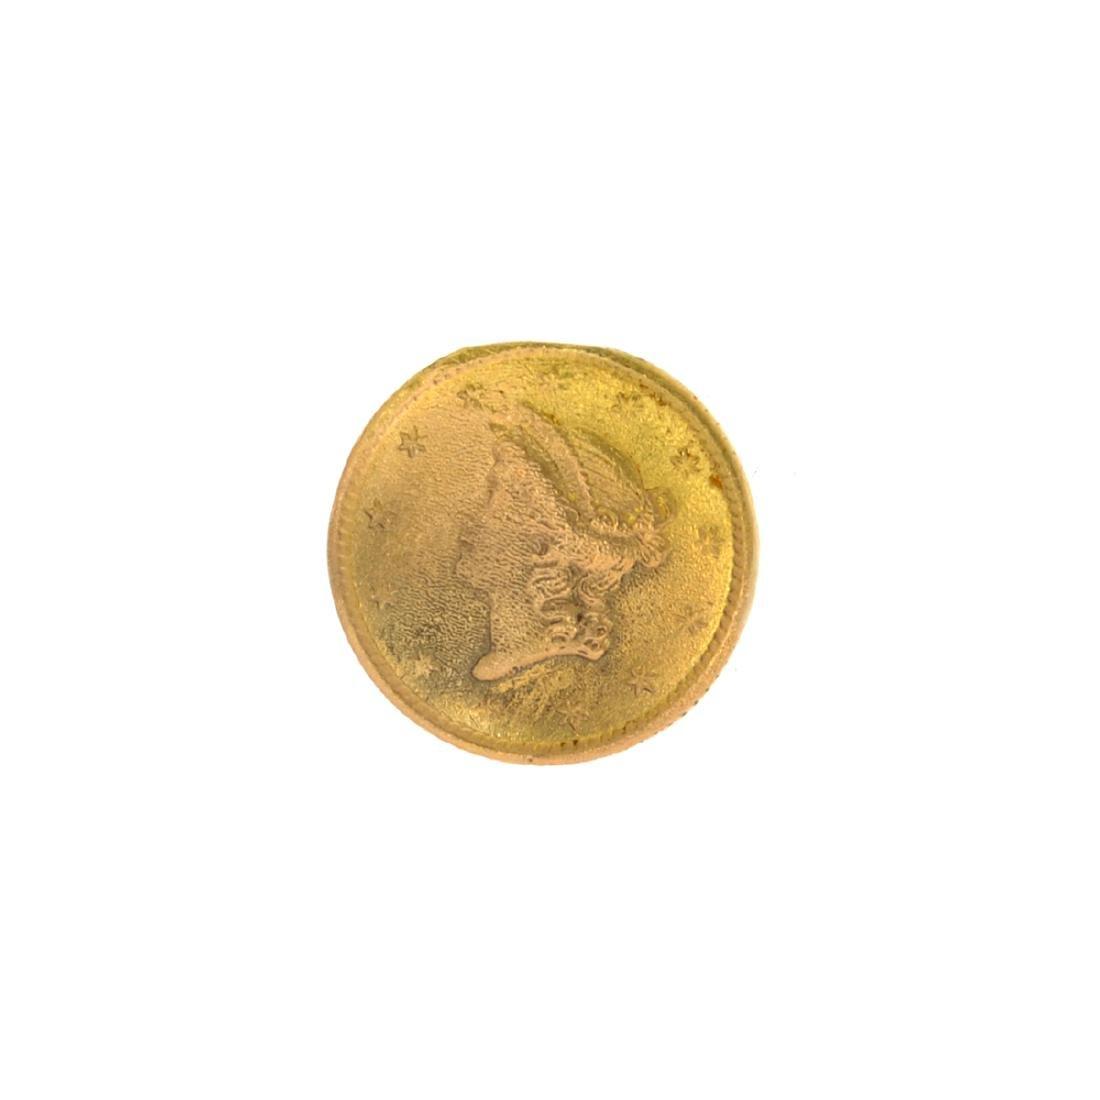 *1852 $1 U.S. Liberty Head Gold Coin (JG N)